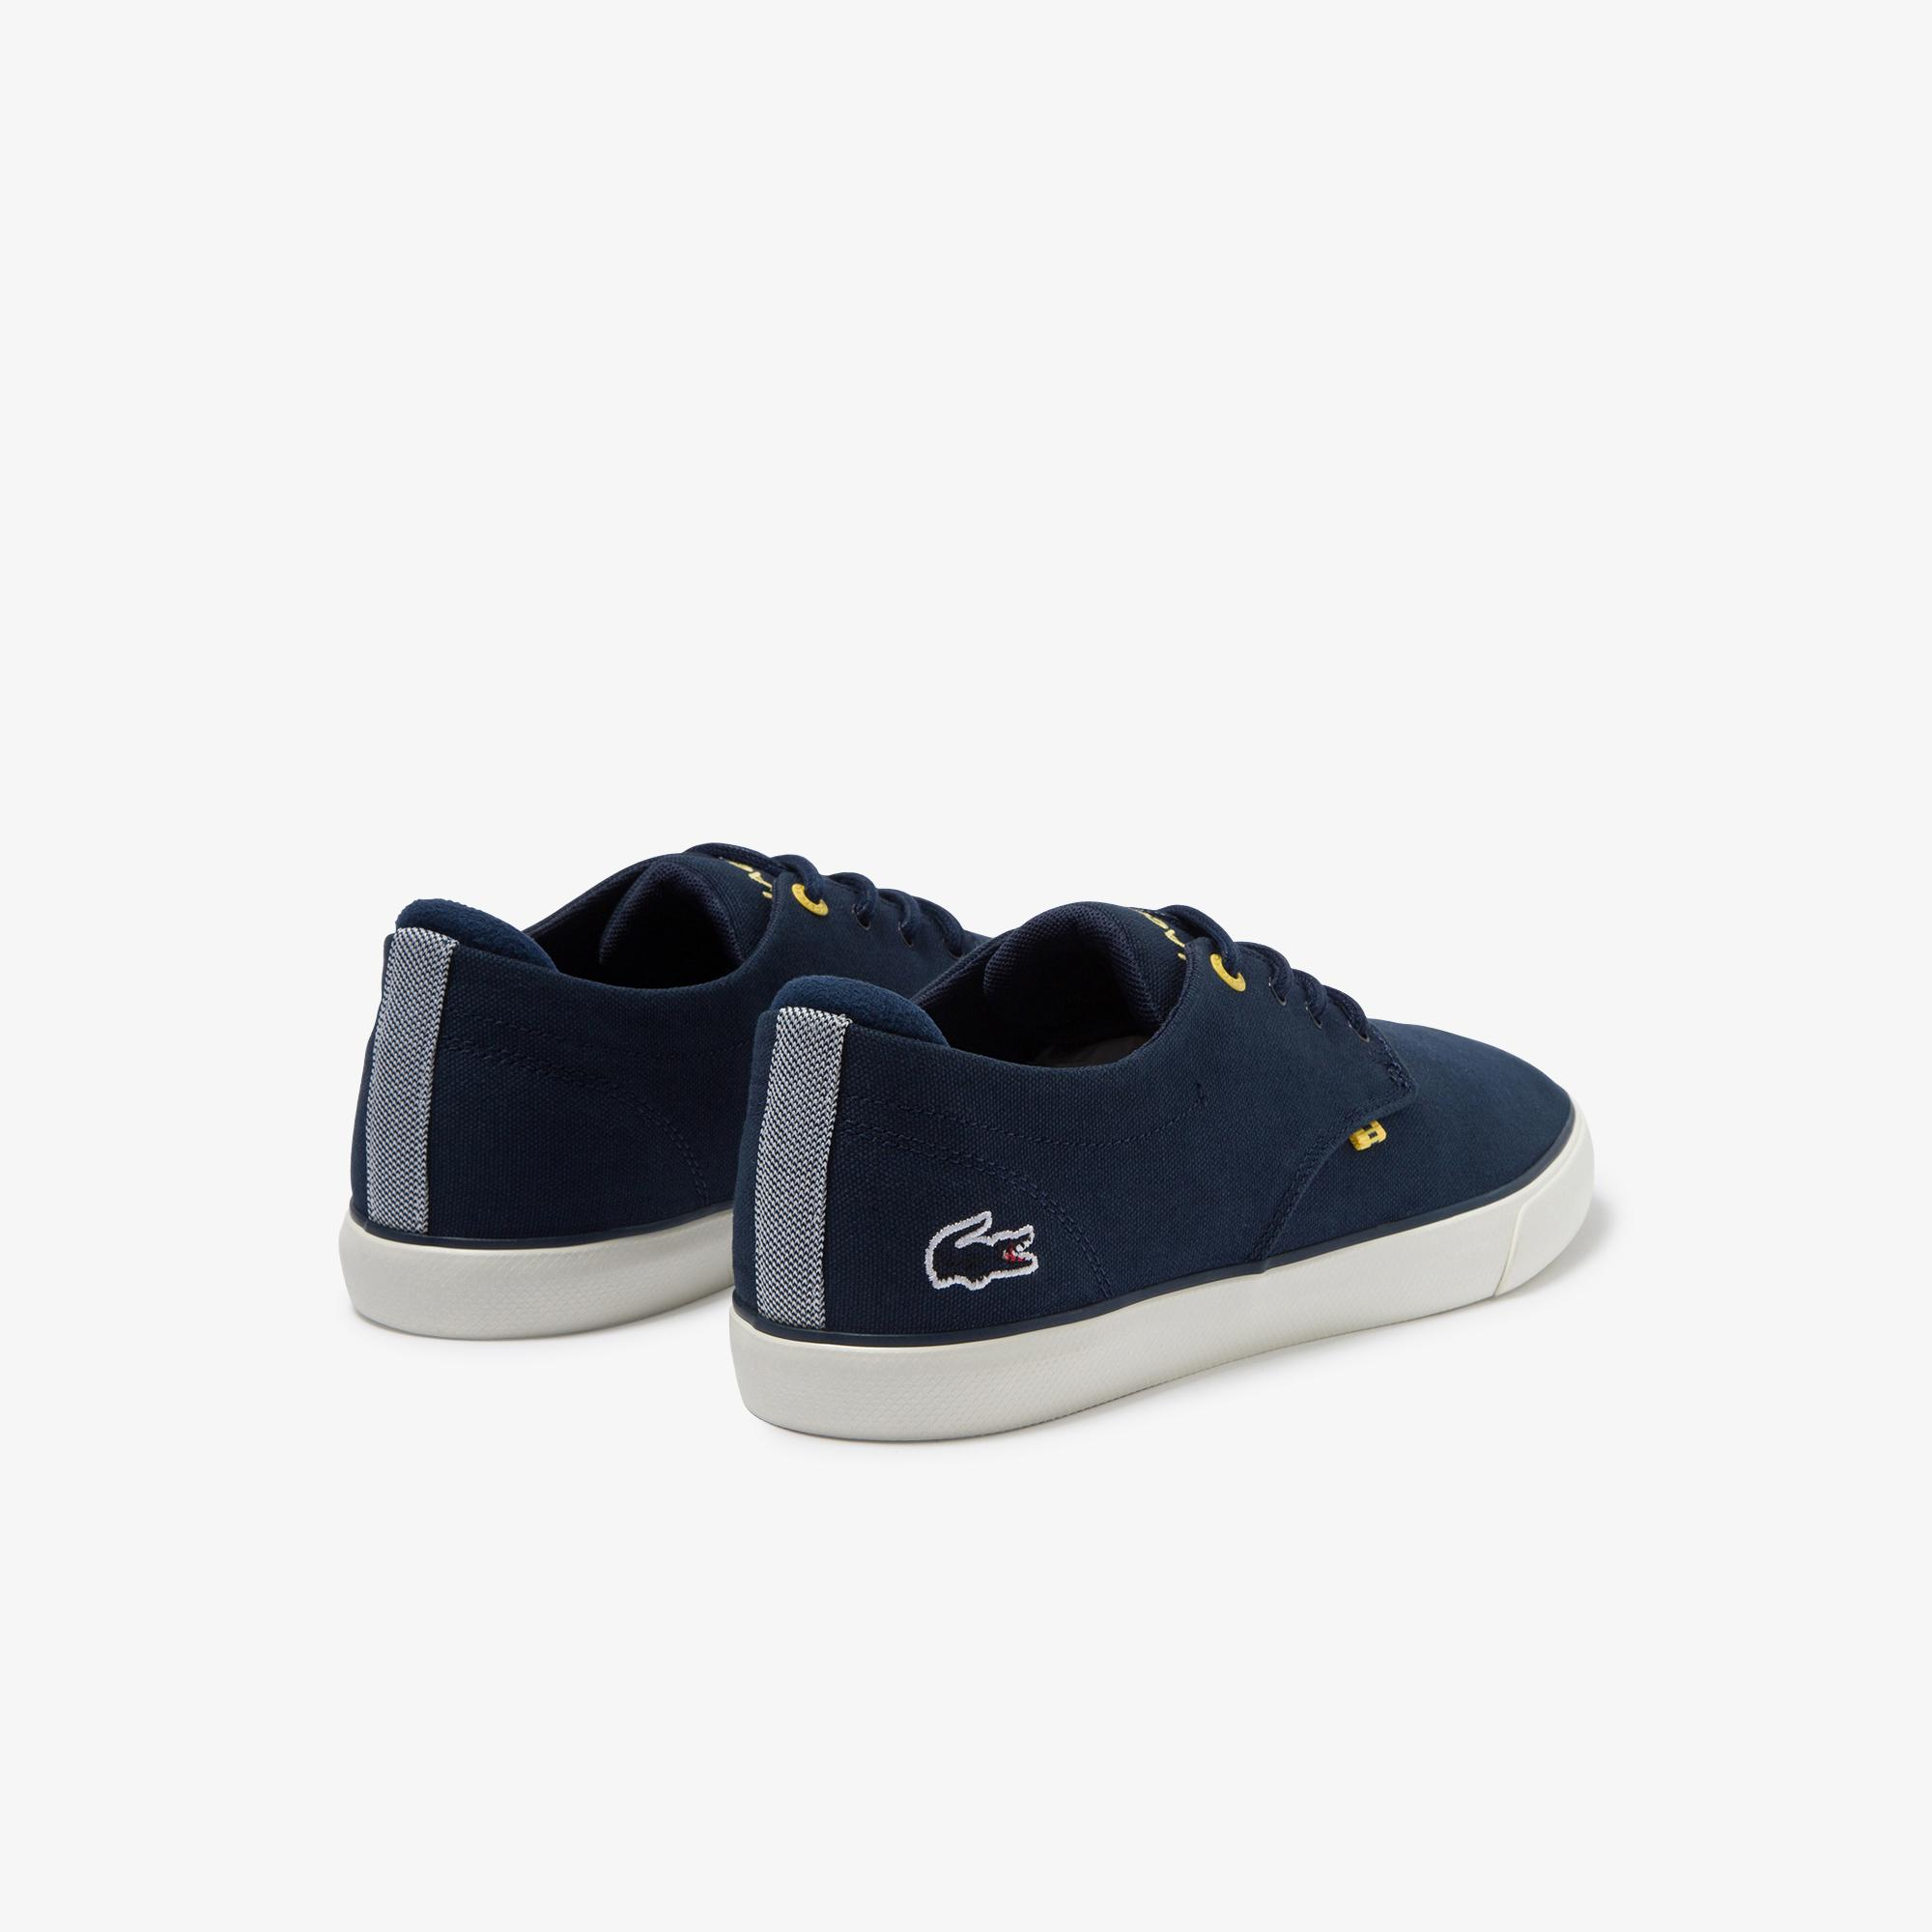 Lacoste кросівки чоловічі Esparre